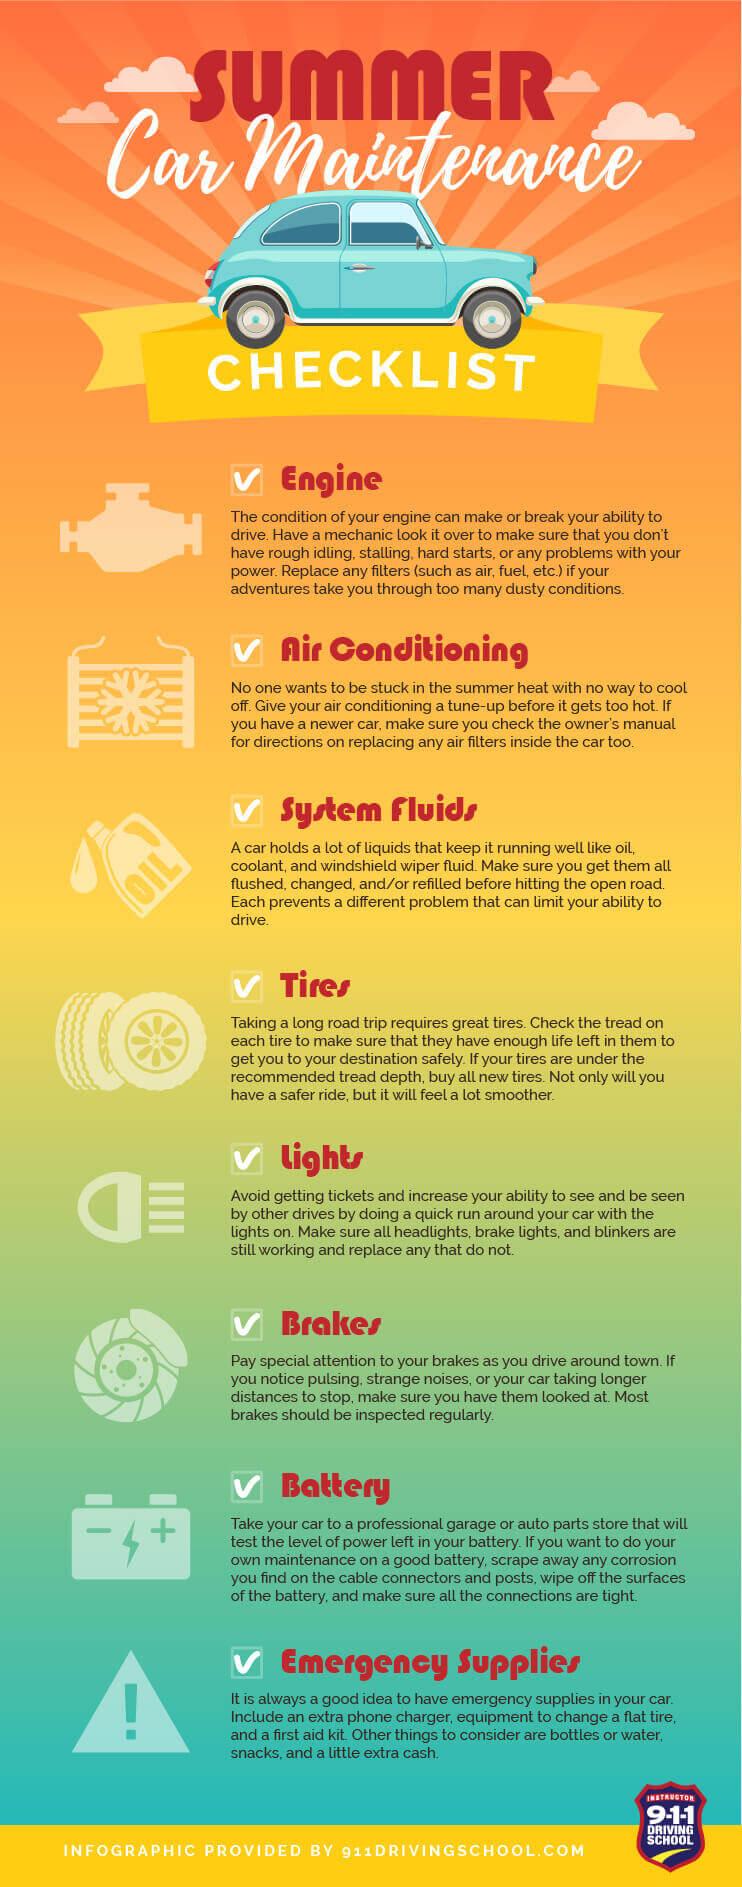 Summer Car Maintenance Checklist